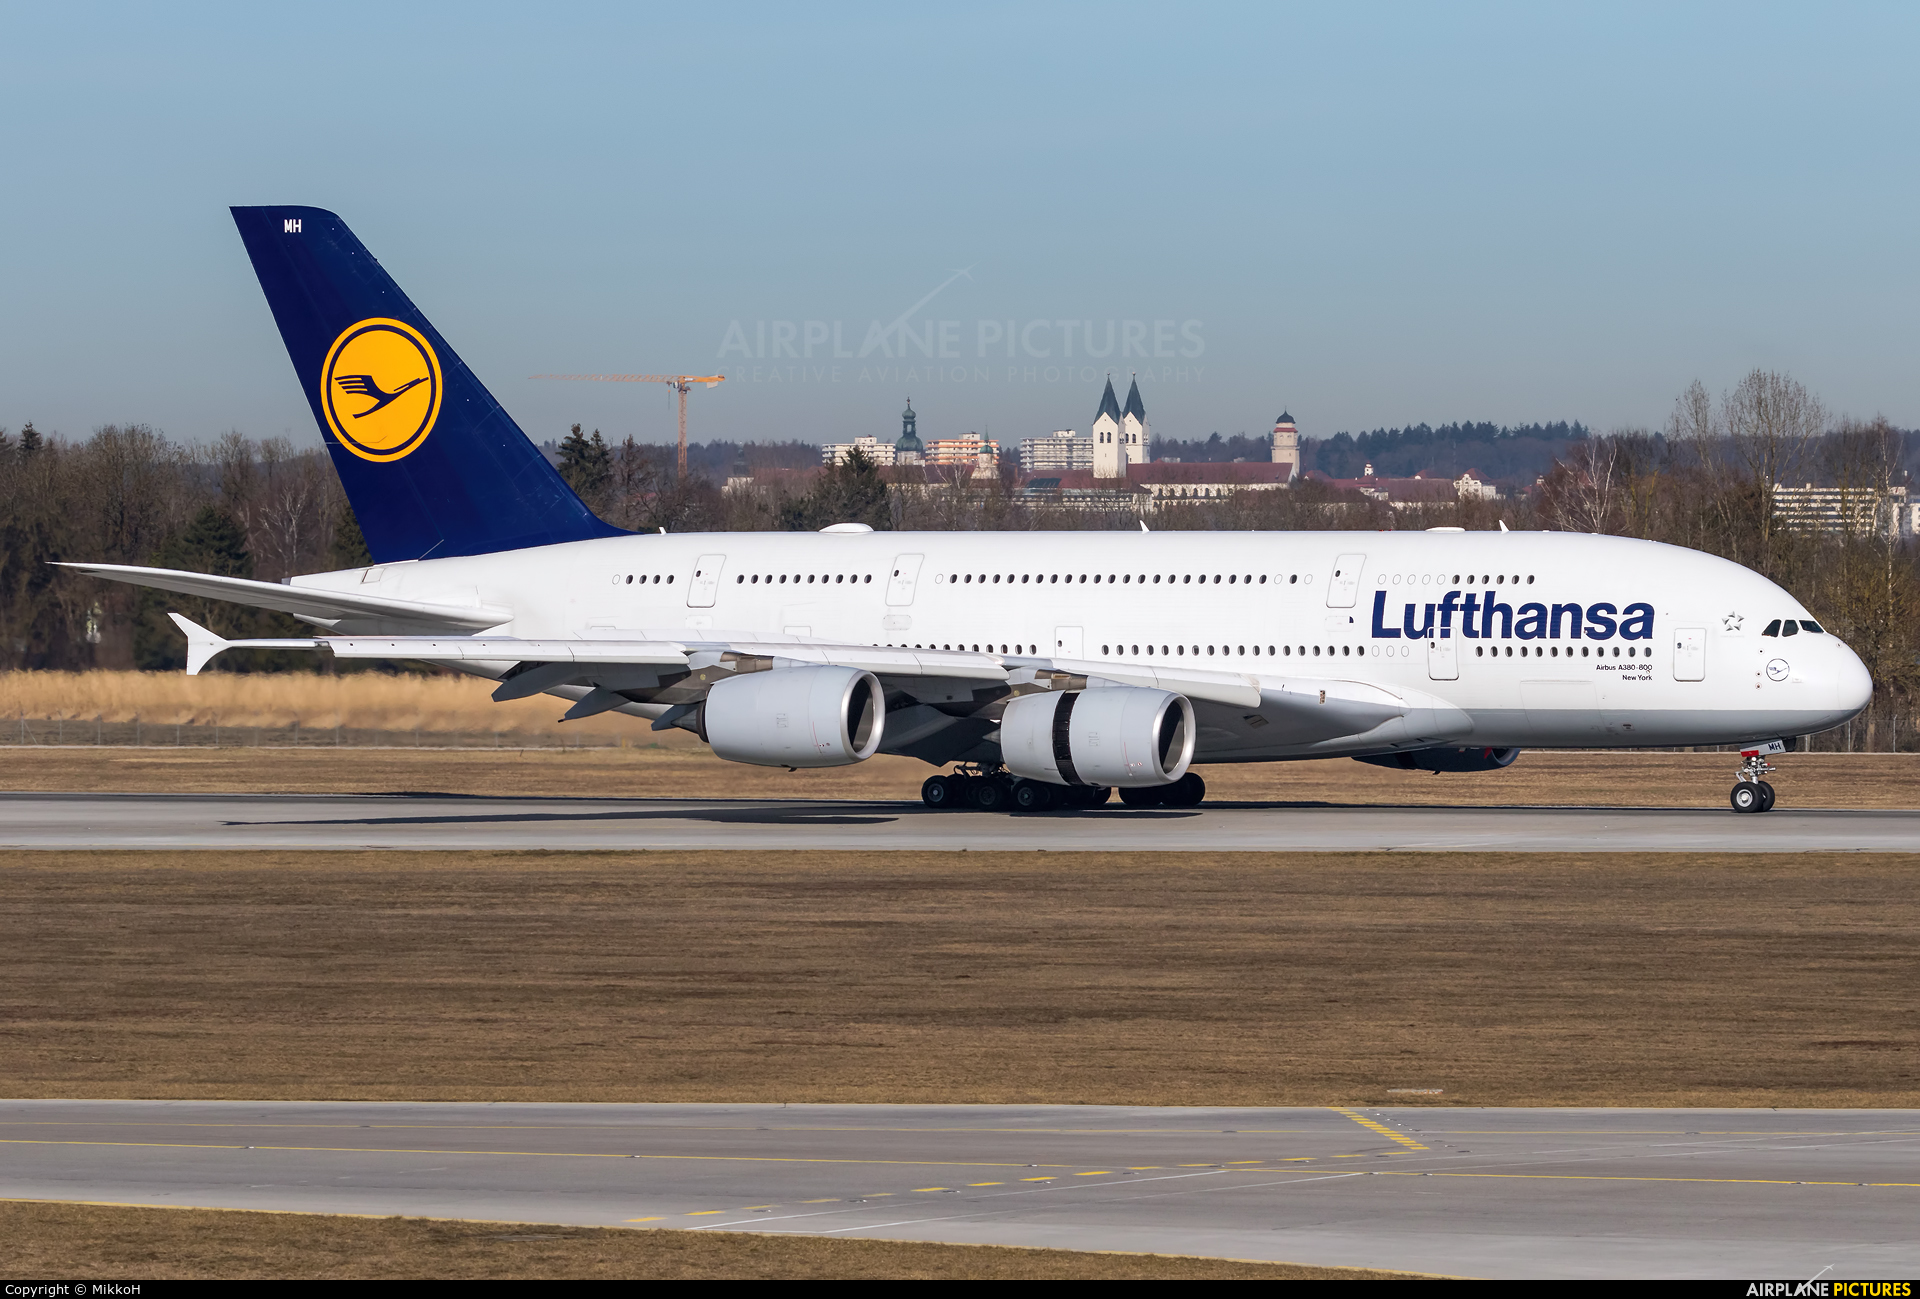 Lufthansa D-AIMH aircraft at Munich